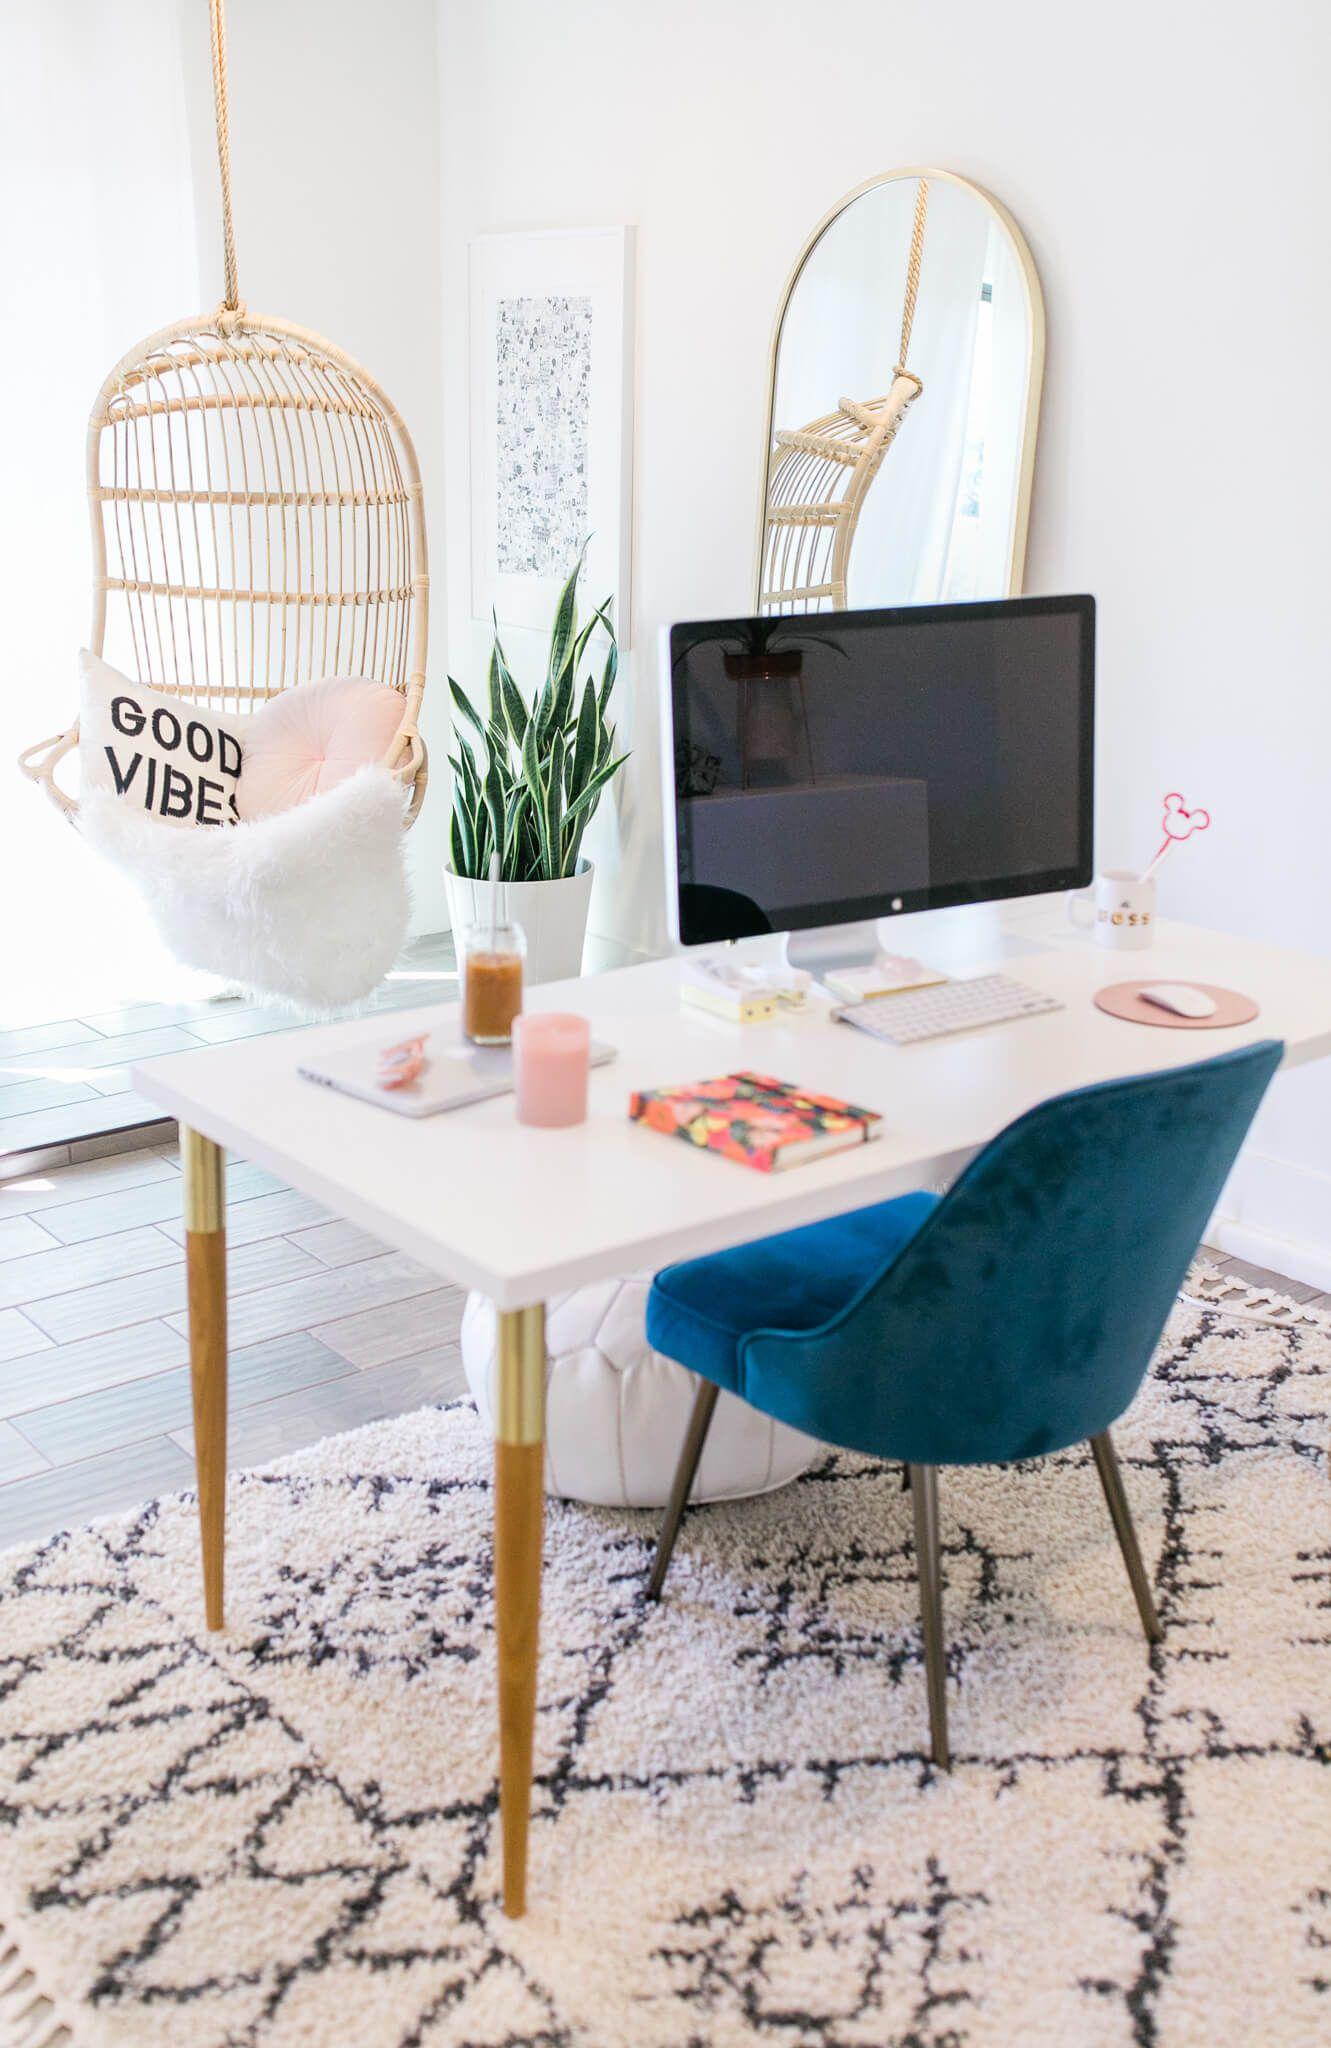 My Minimal California Inspired Home Office Emmygination Chic